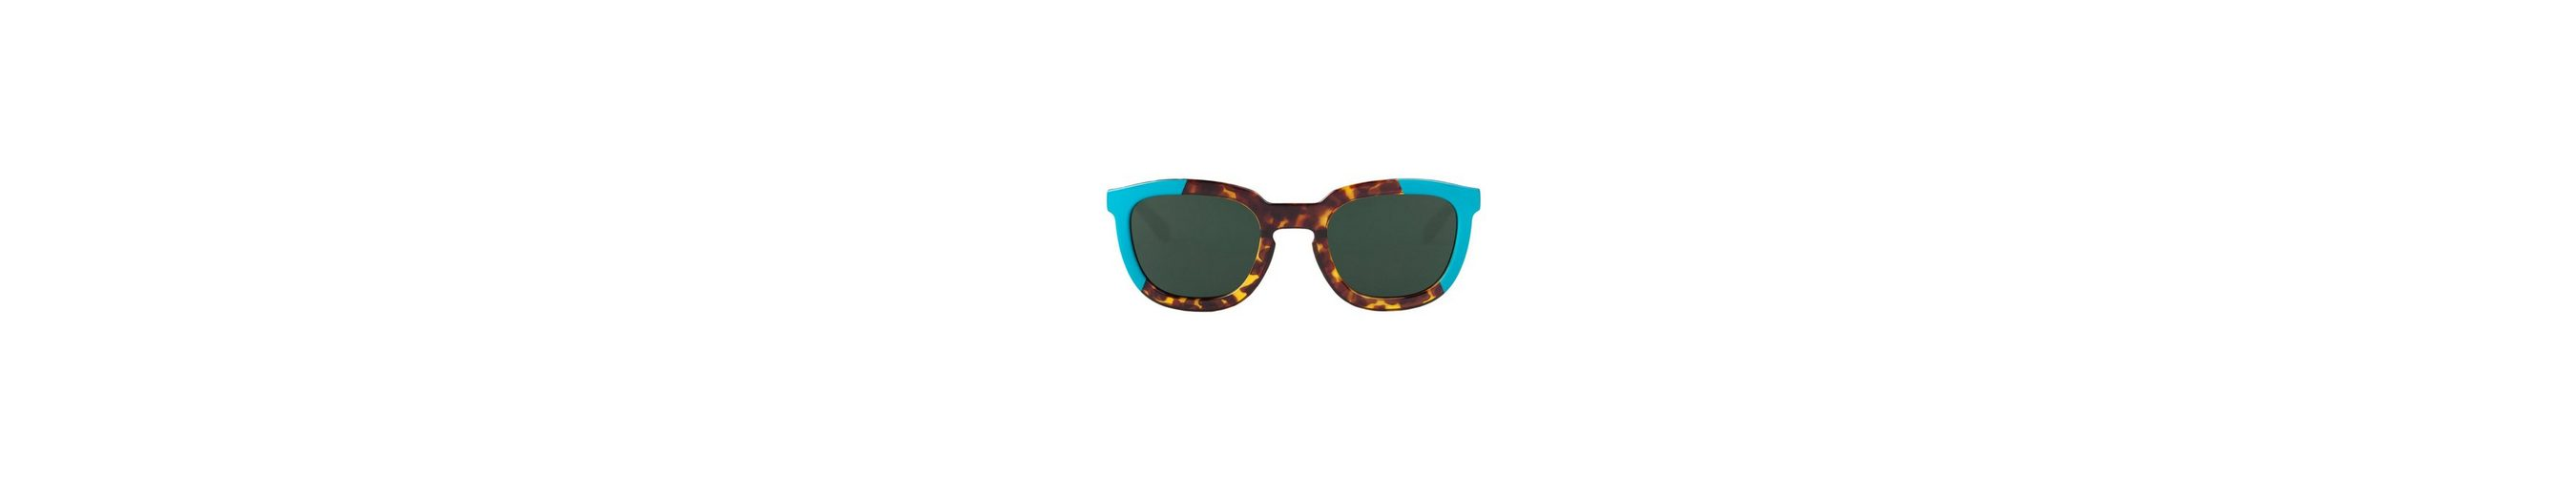 Mr. Boho Sonnenbrille »Turquoise/Cheetah Tortoise Lemarais mit klassische«